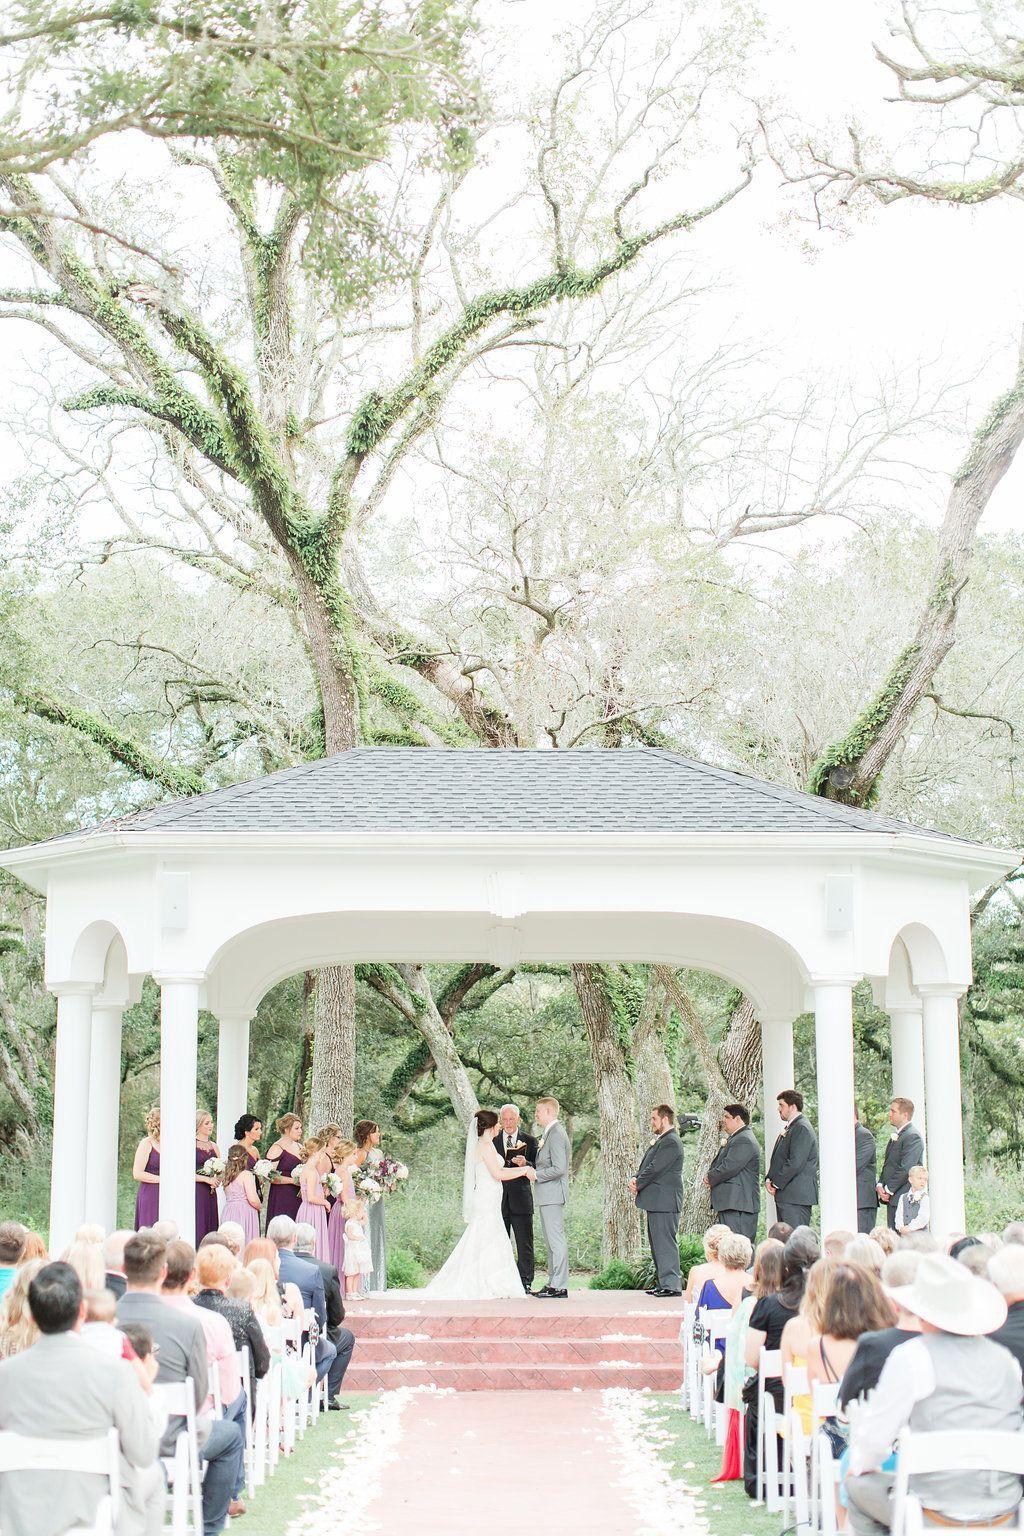 Outdoor Houston Wedding Venue Manor Outdoor Wedding Venue Mansion Outdoor Wedding Ven Southern Wedding Venues Luxury Wedding Venues Wedding Venue Houston